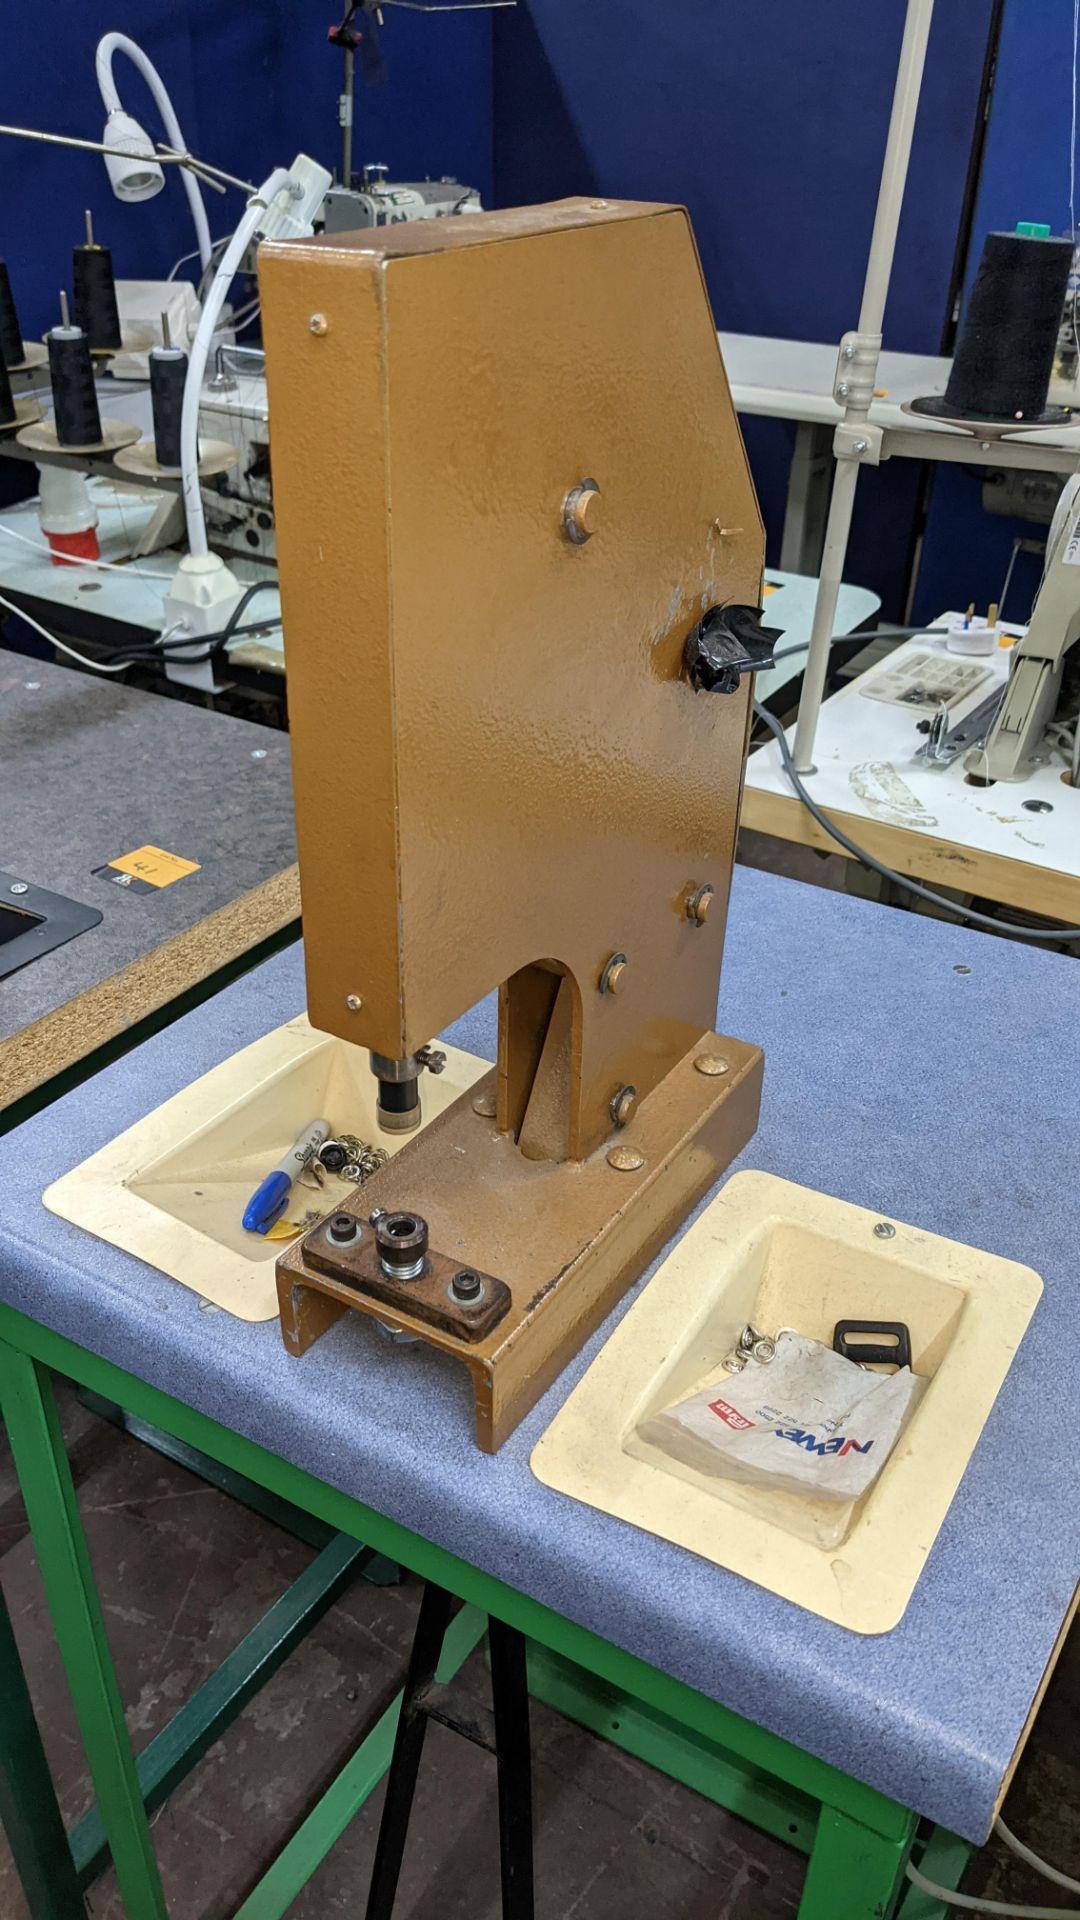 Foot operated riveting machine/press stud machine - Image 3 of 8